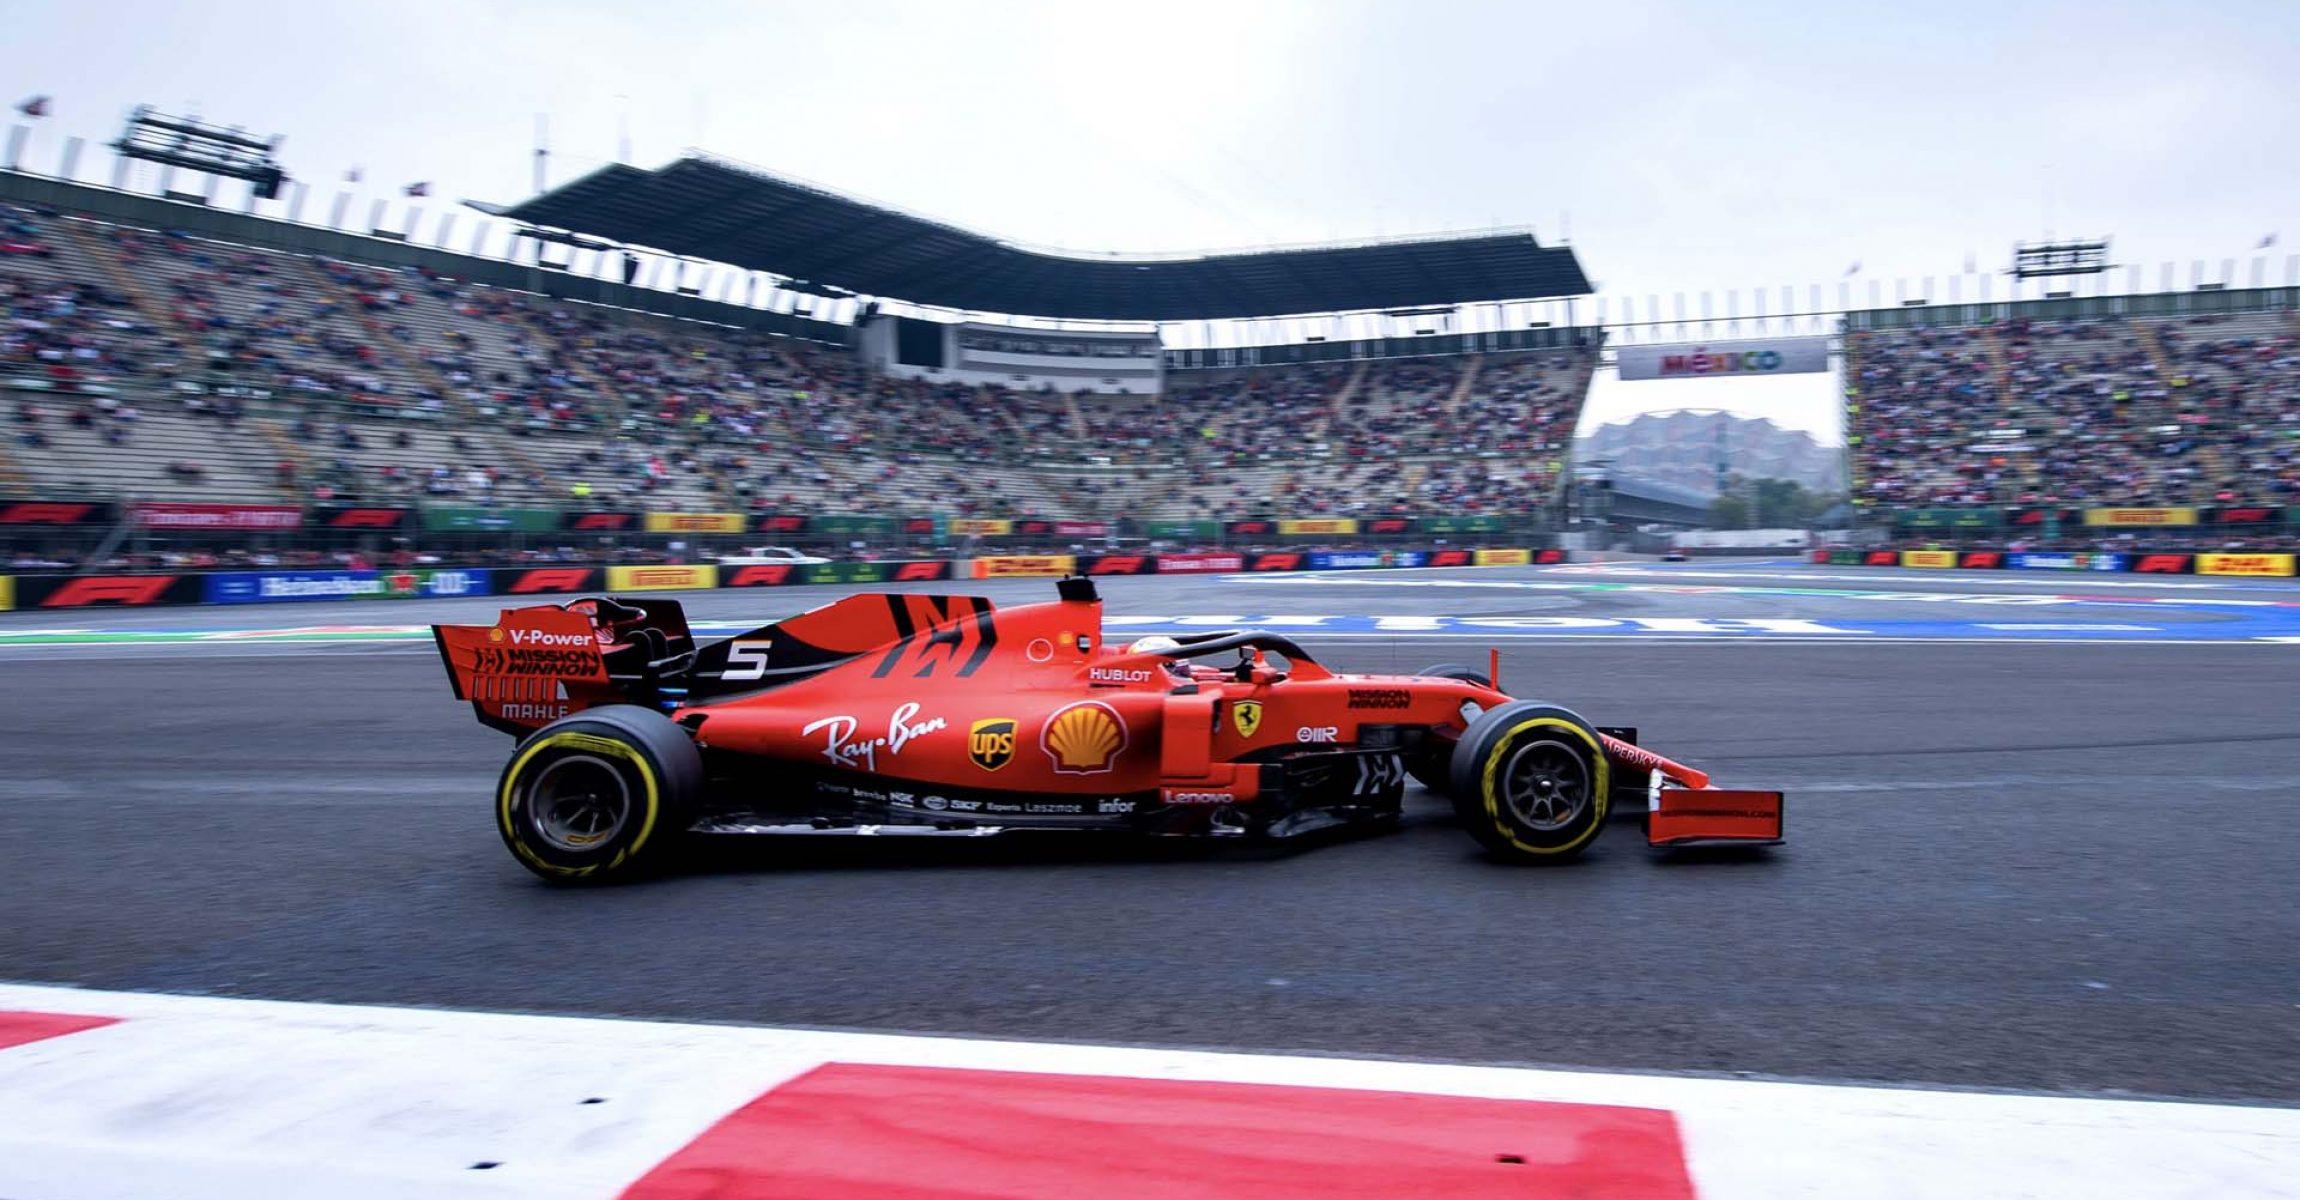 GP MESSICO F1/2019 - VENERDÌ 25/10/2019 credit: @Scuderia Ferrari Press Office Sebastian Vettel Ferrari